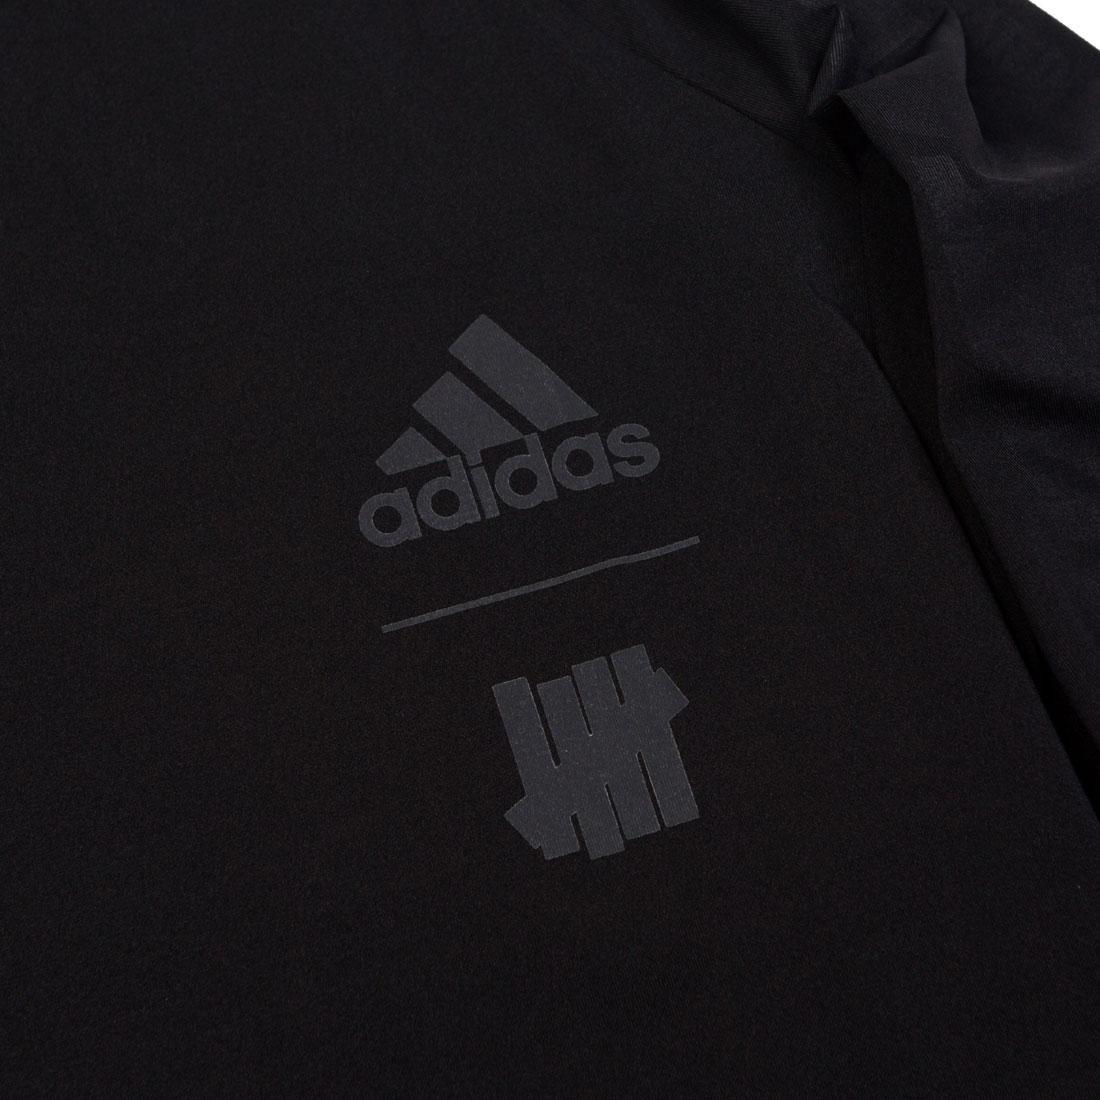 the latest 58fa7 32c14 Adidas x Undefeated Men Alphaskin Tech 34 Tee (black)